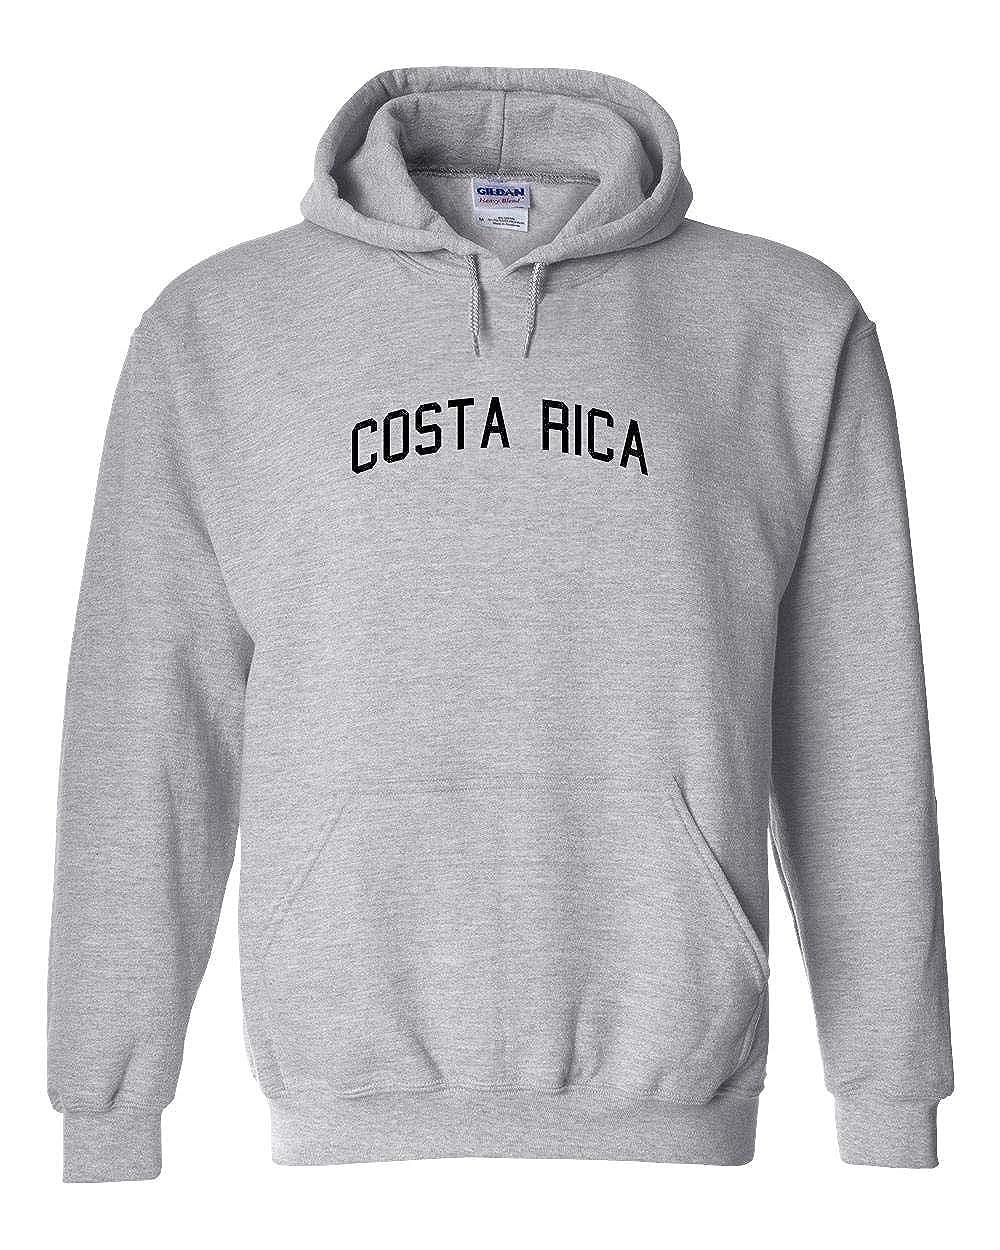 Uncensored Shirts Costa Rica Hoodie